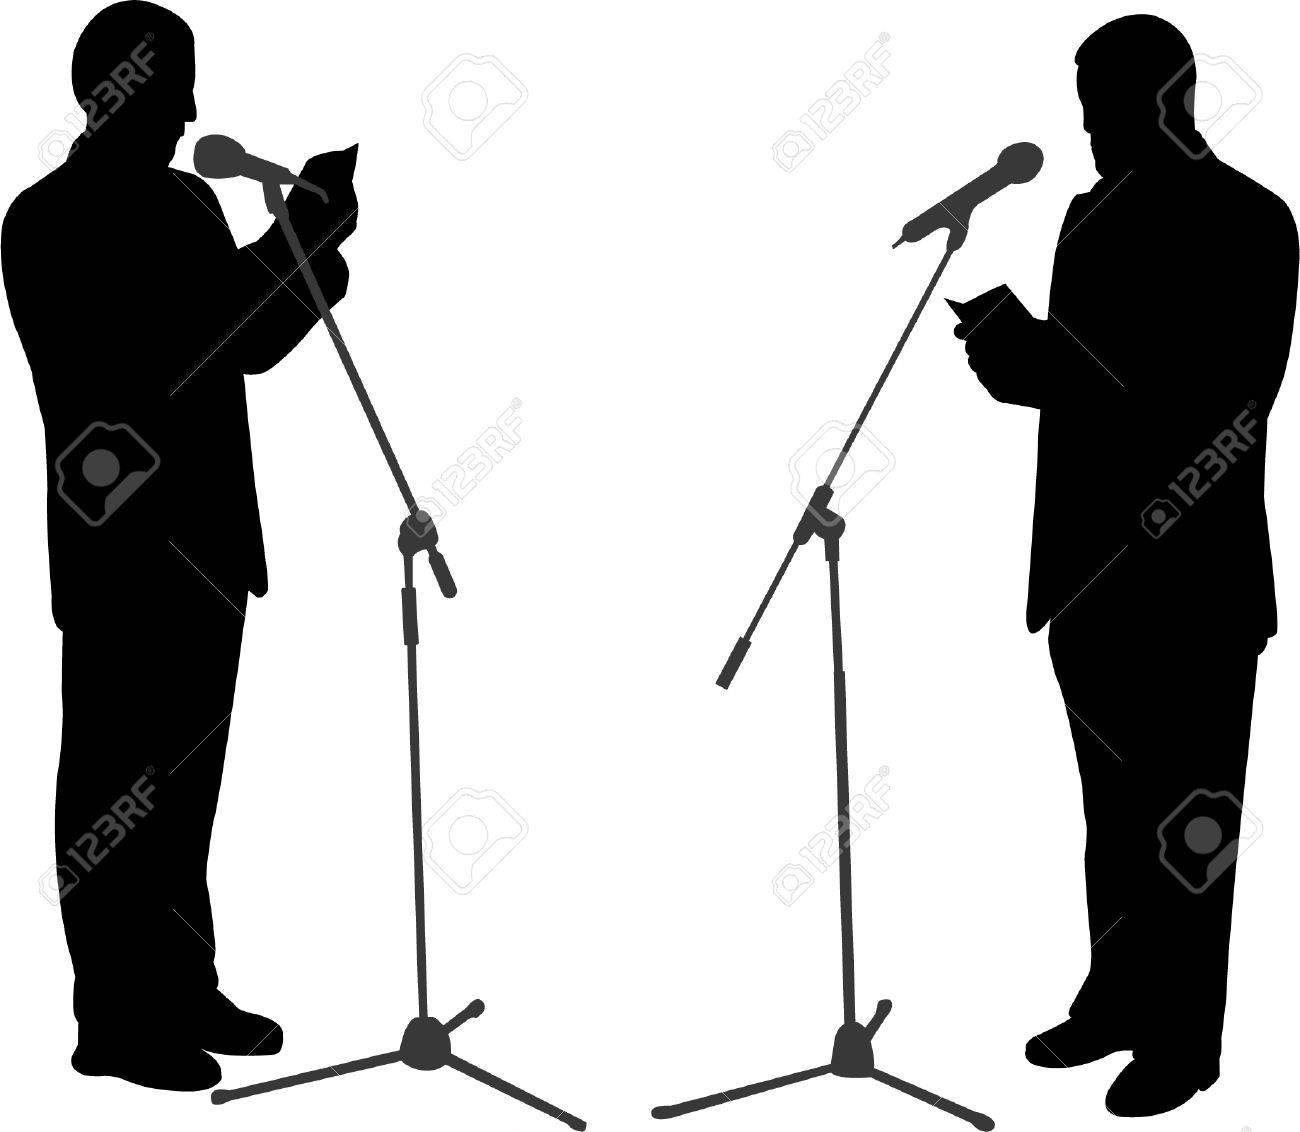 silhouettes of men public speaking - vector Stock Vector - 8422229